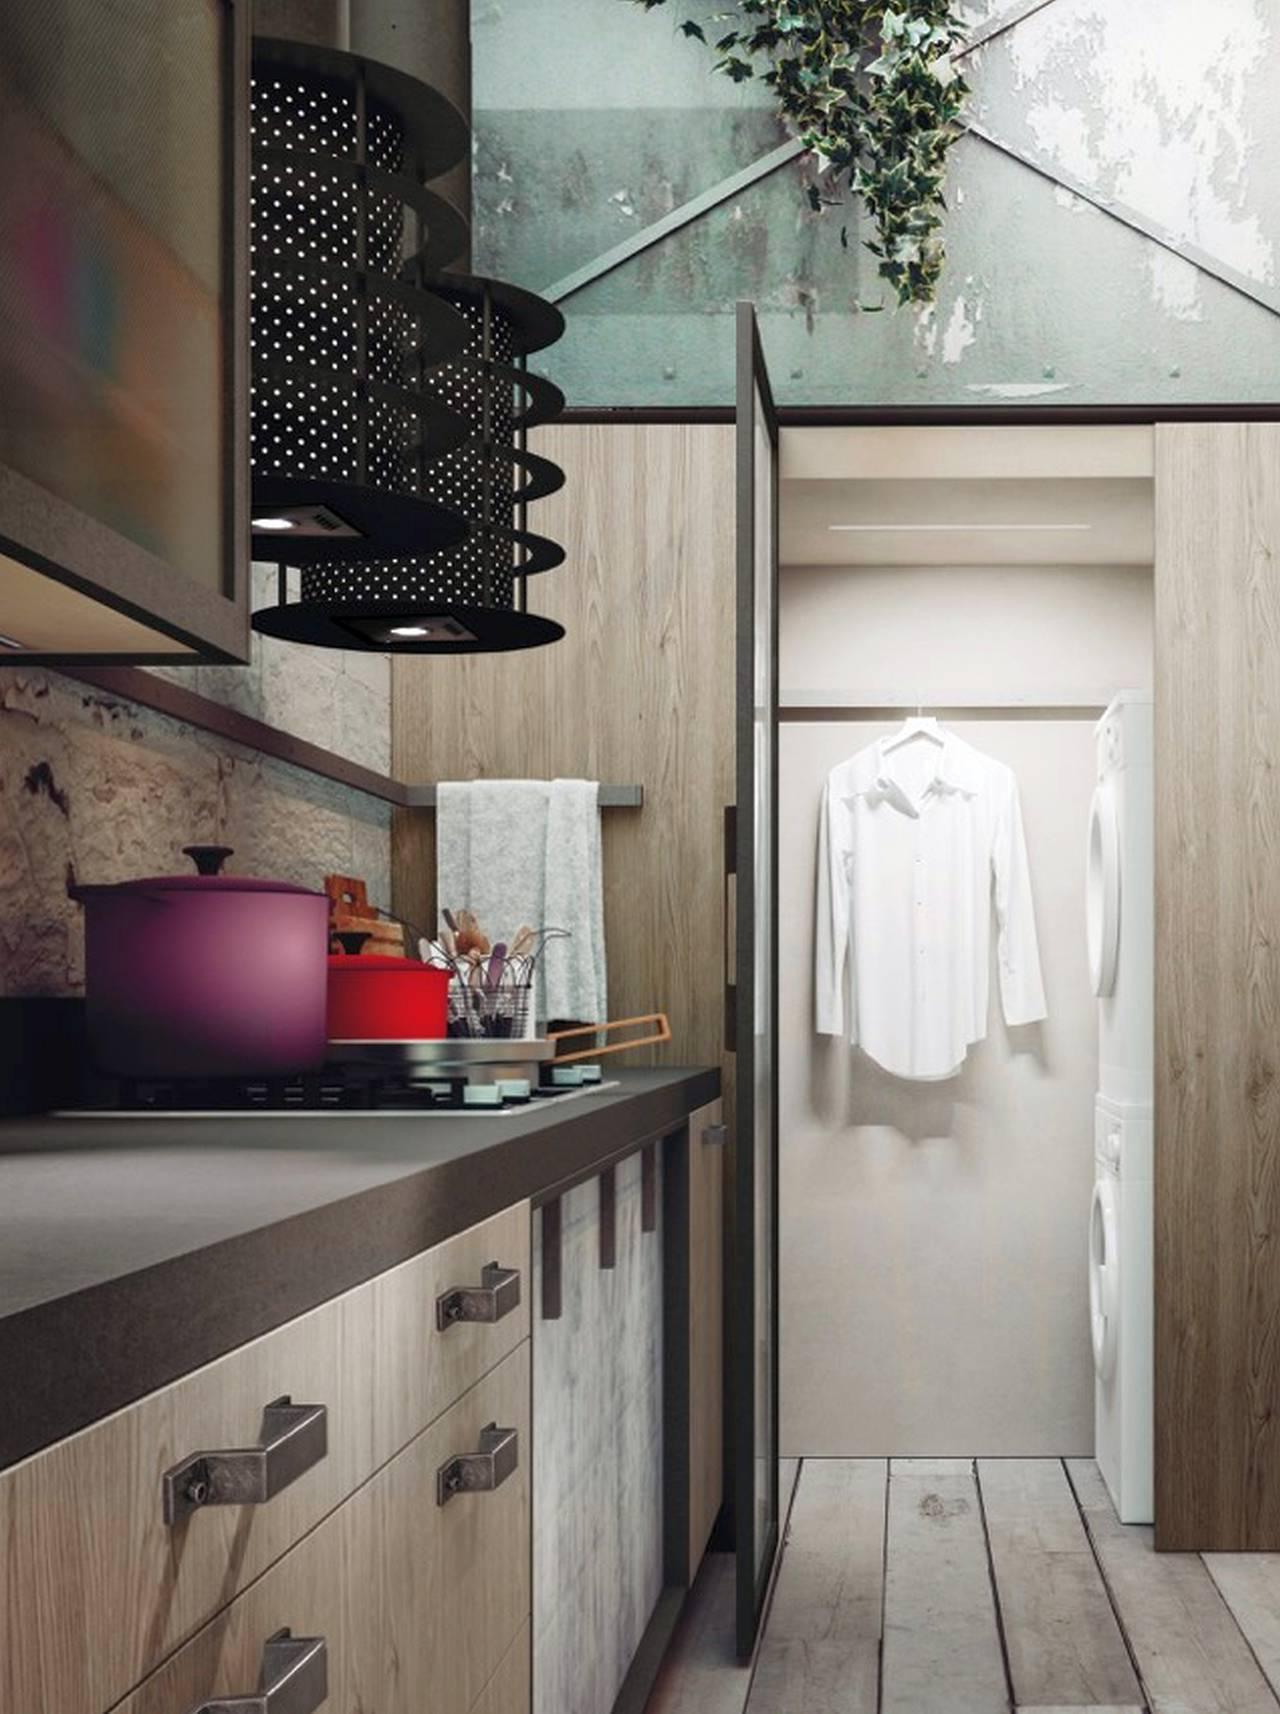 Asciugatrice Dentro Cabina Armadio lavanderia integrata in cucina | ambiente cucina